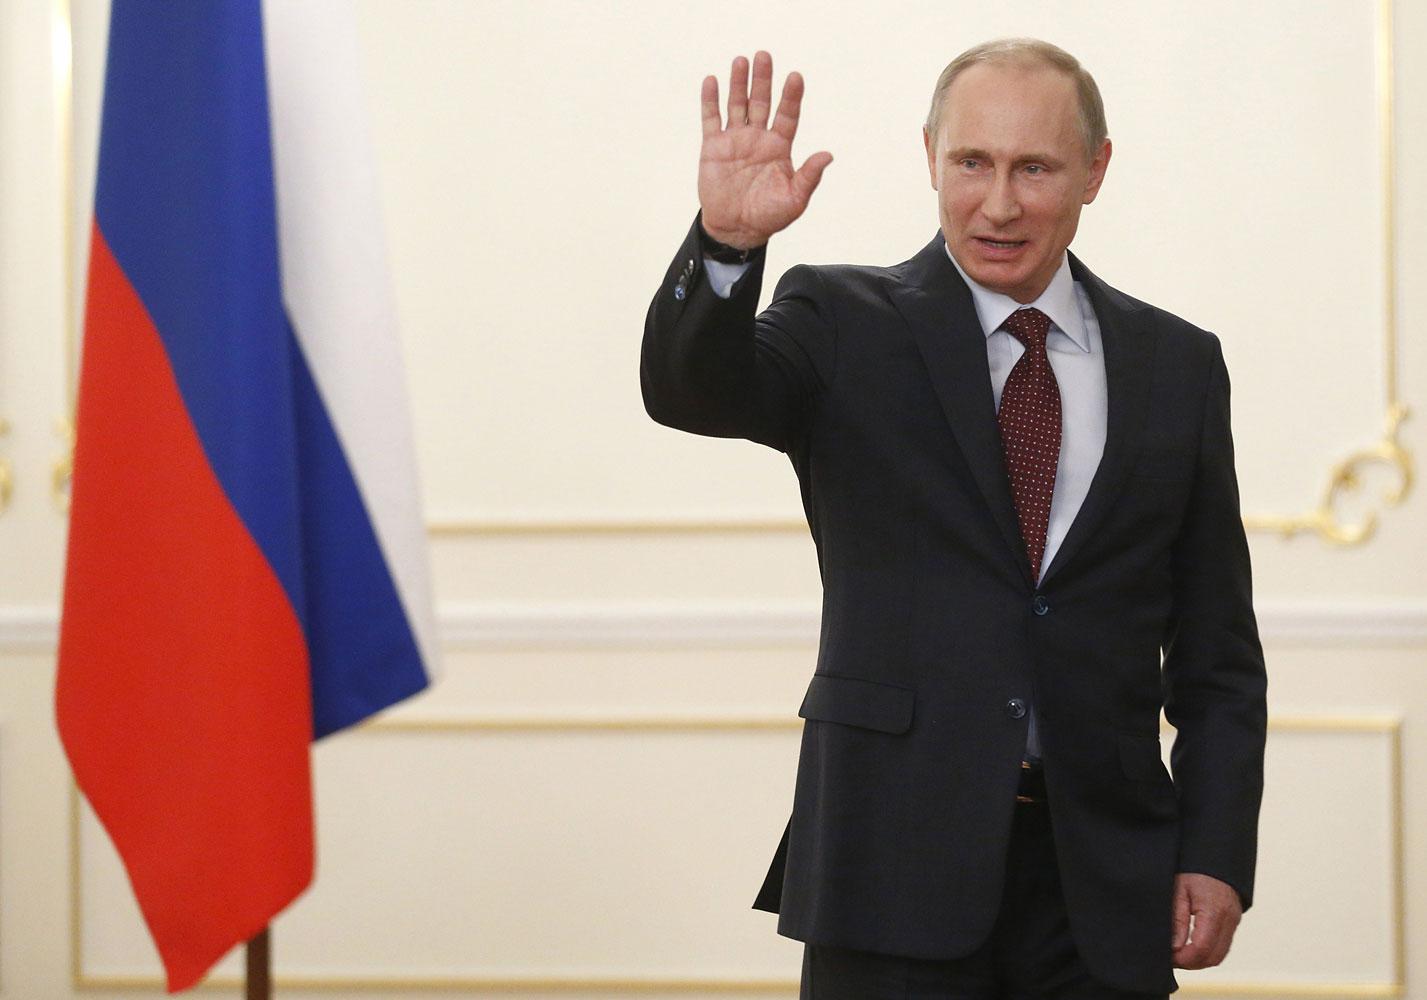 Vladimir Putin waves in his Novo-Ogaryovo residence outside Moscow, on April 18, 2014.